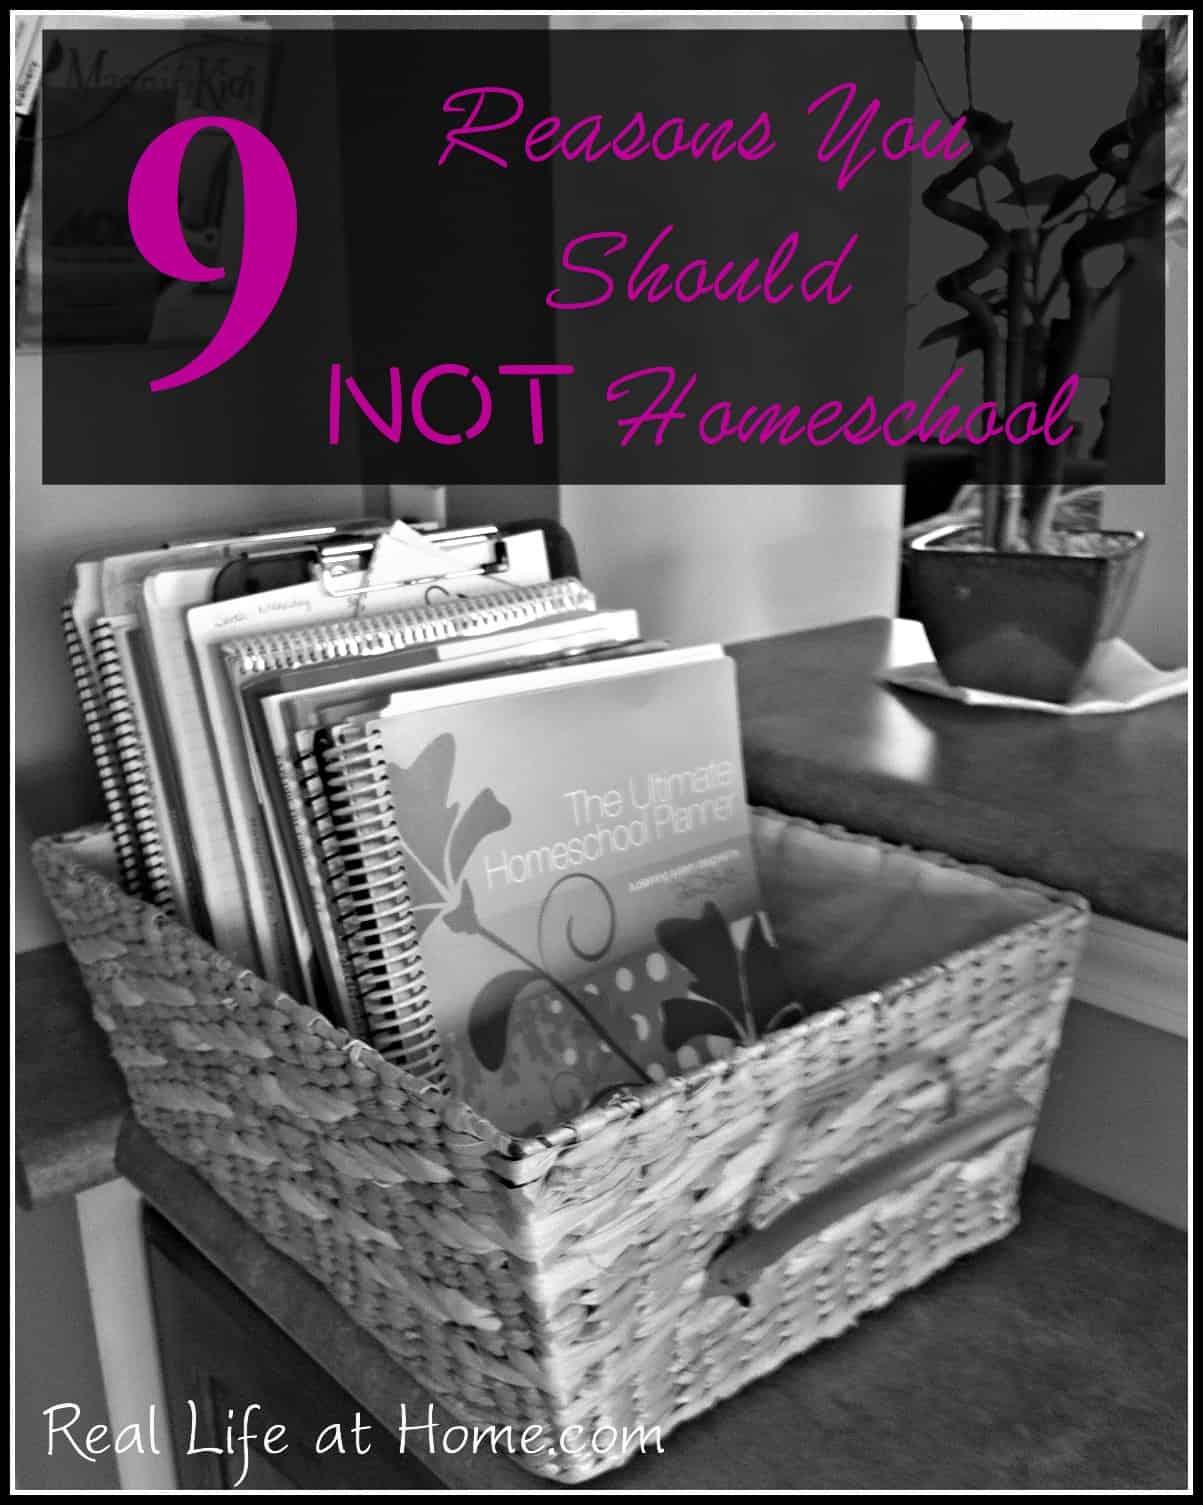 9 Reasons You Should Not Homeschool